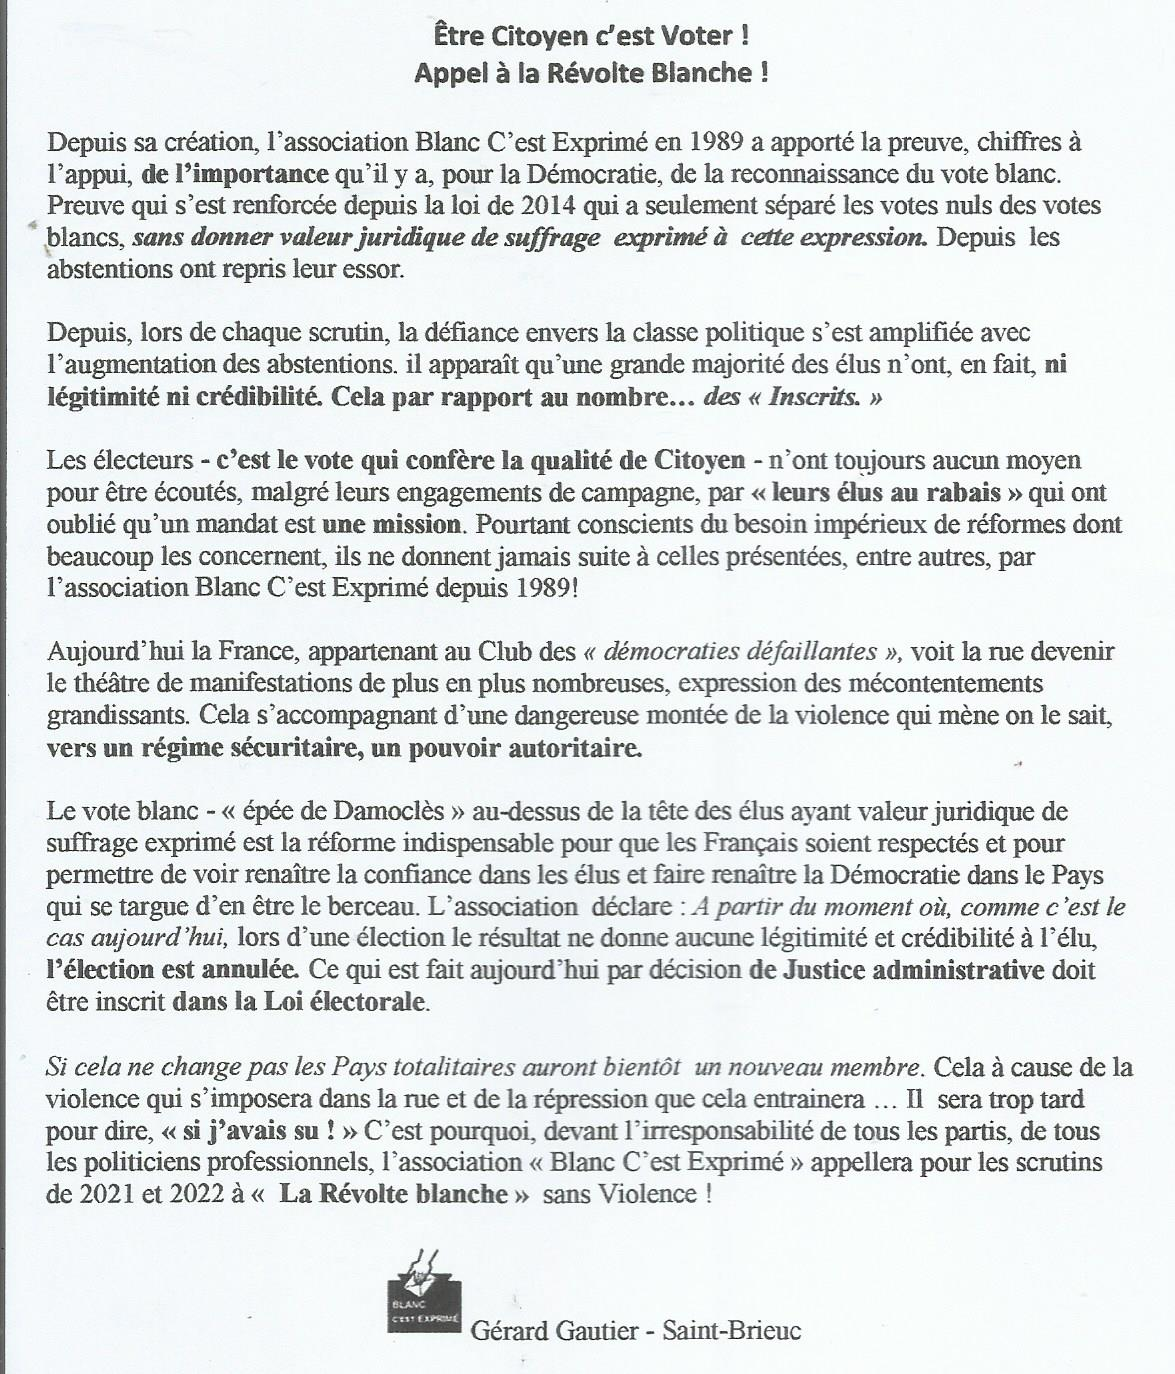 BCE SCRUTINS 2021 PROSPECTUS Verso 3